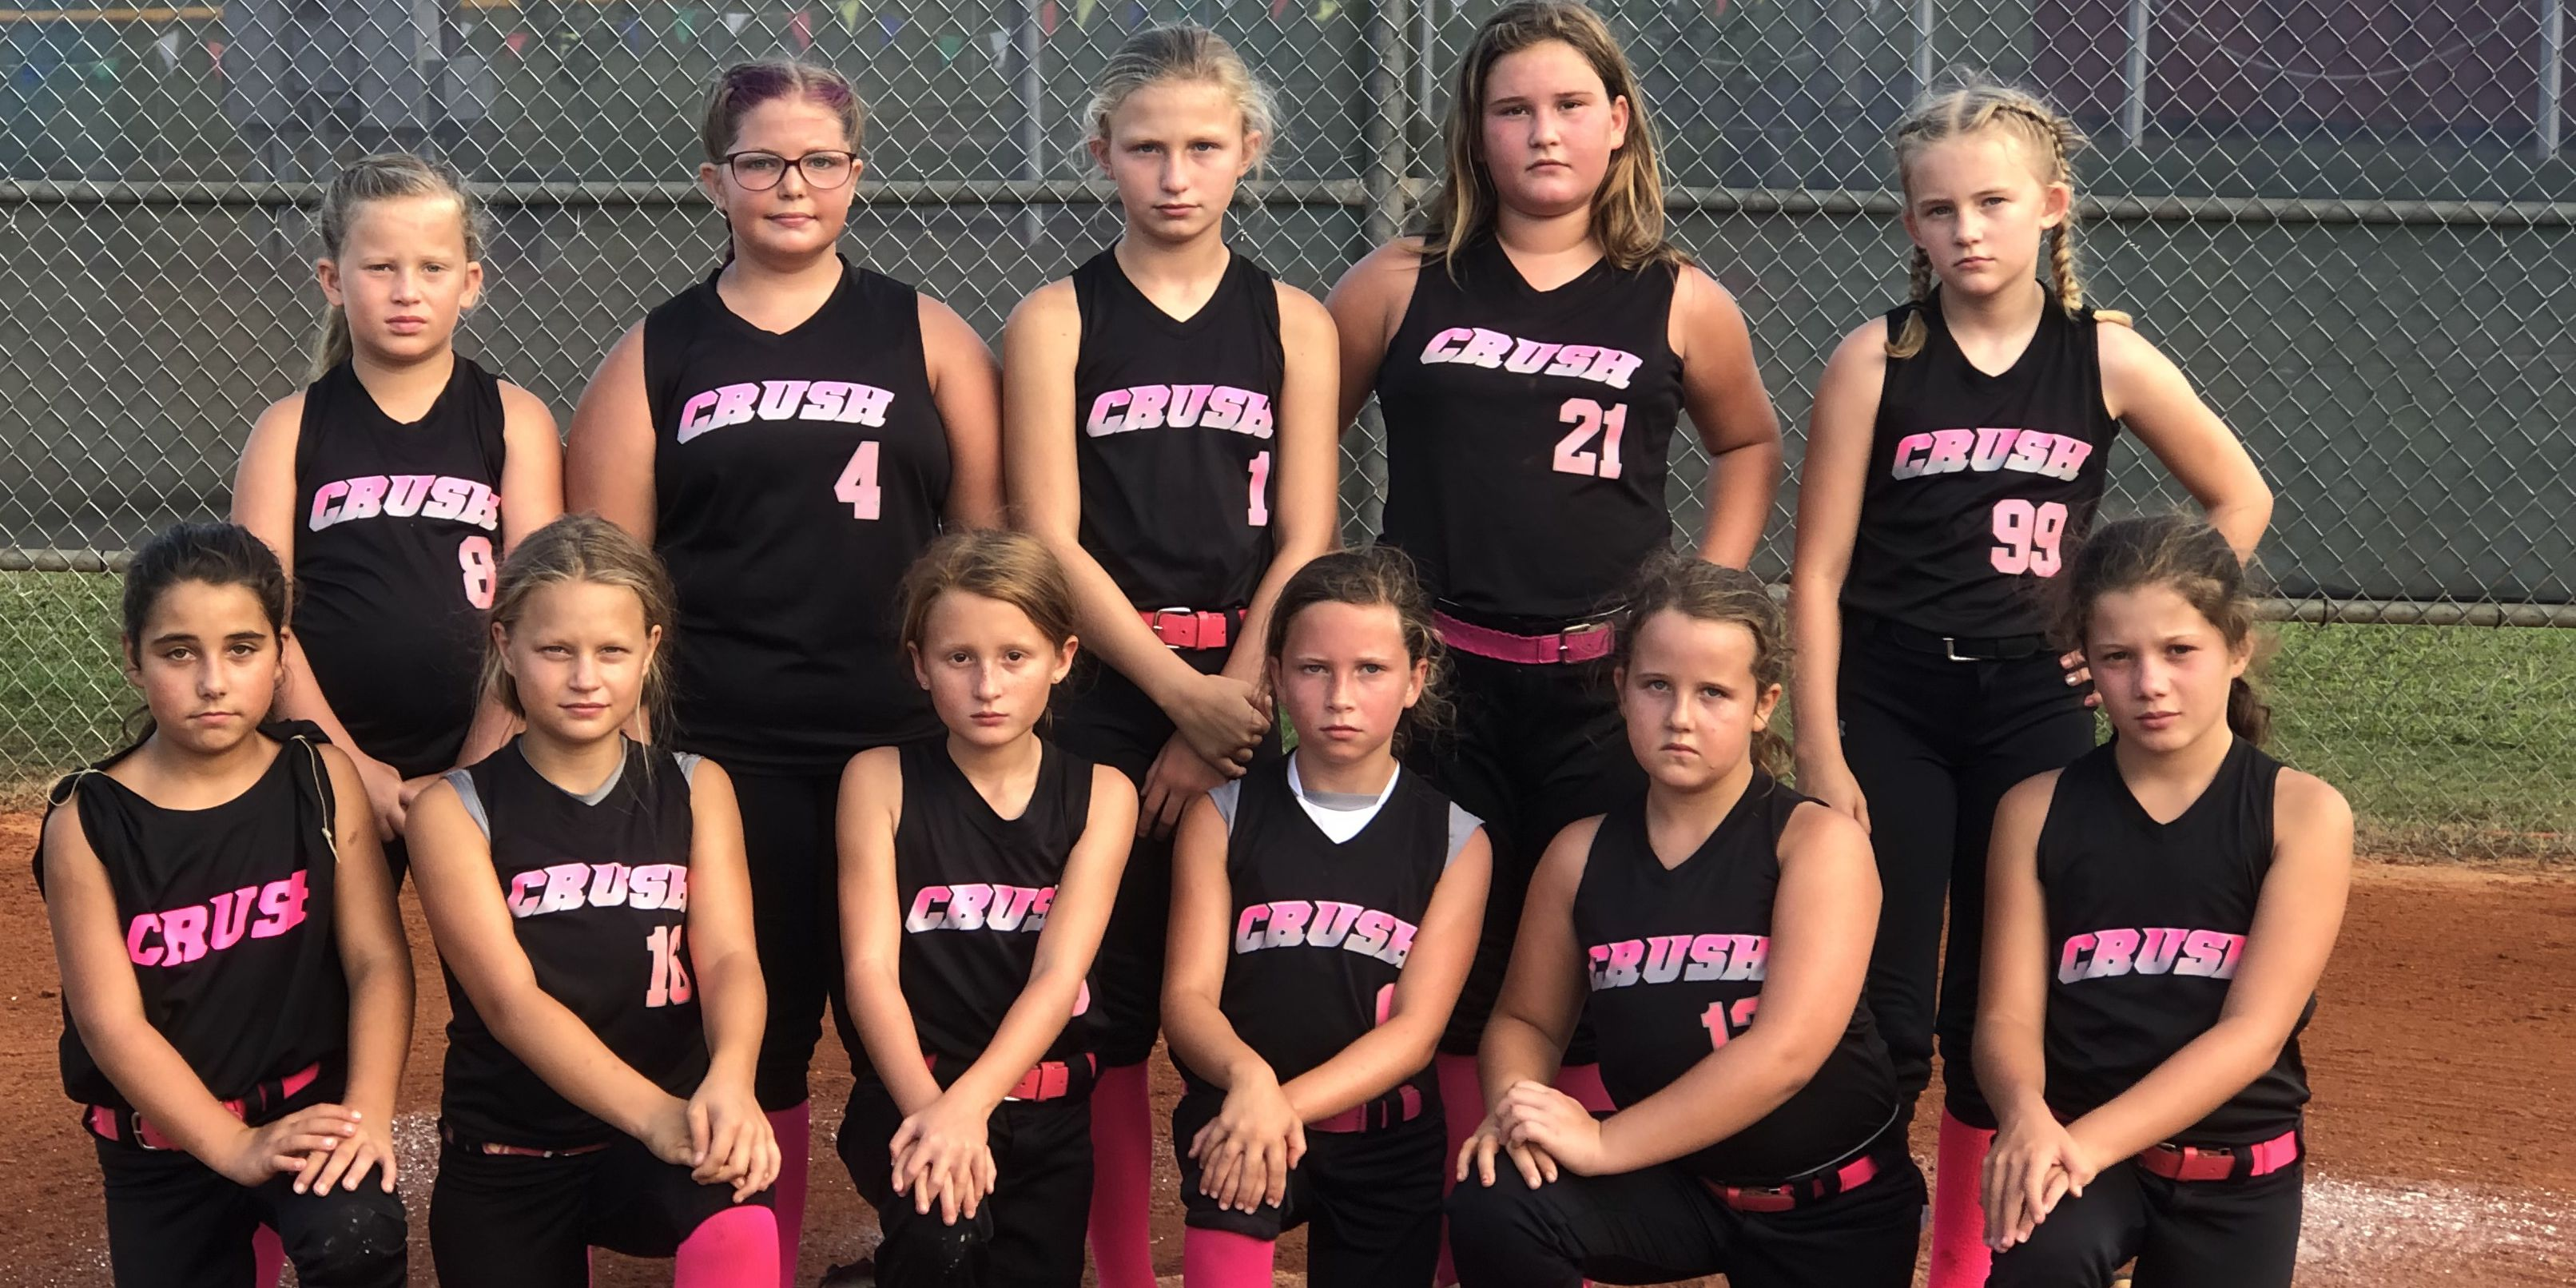 Local travel softball team preparing for major tournament